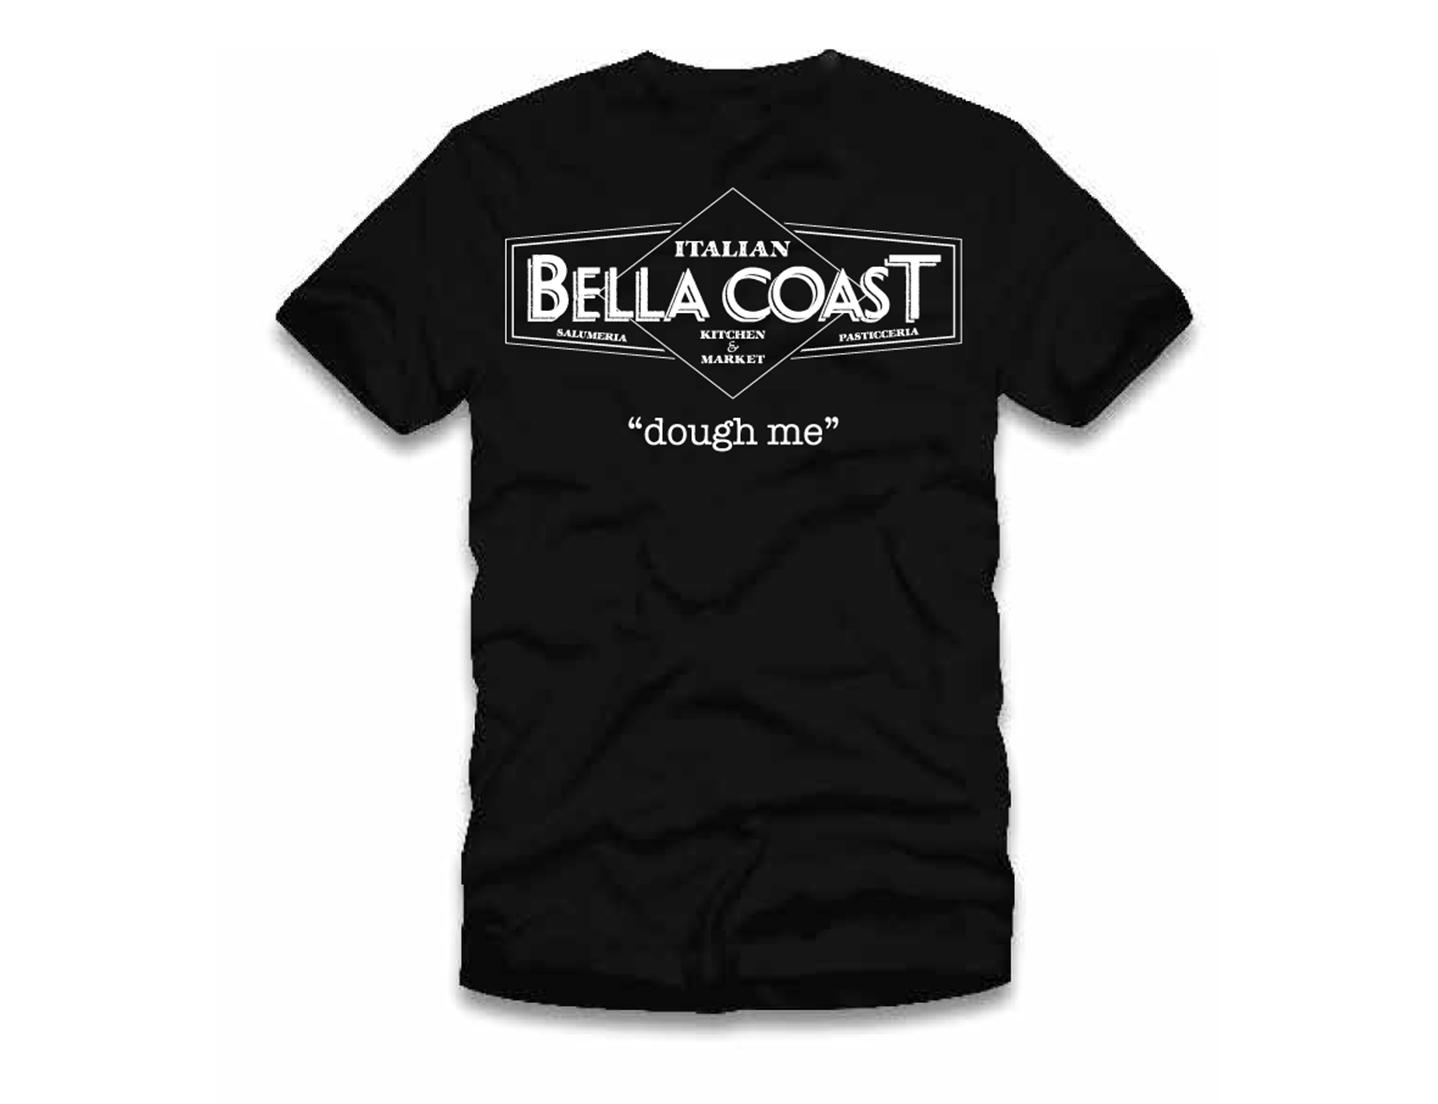 bella coast tshirt_thumb.jpg